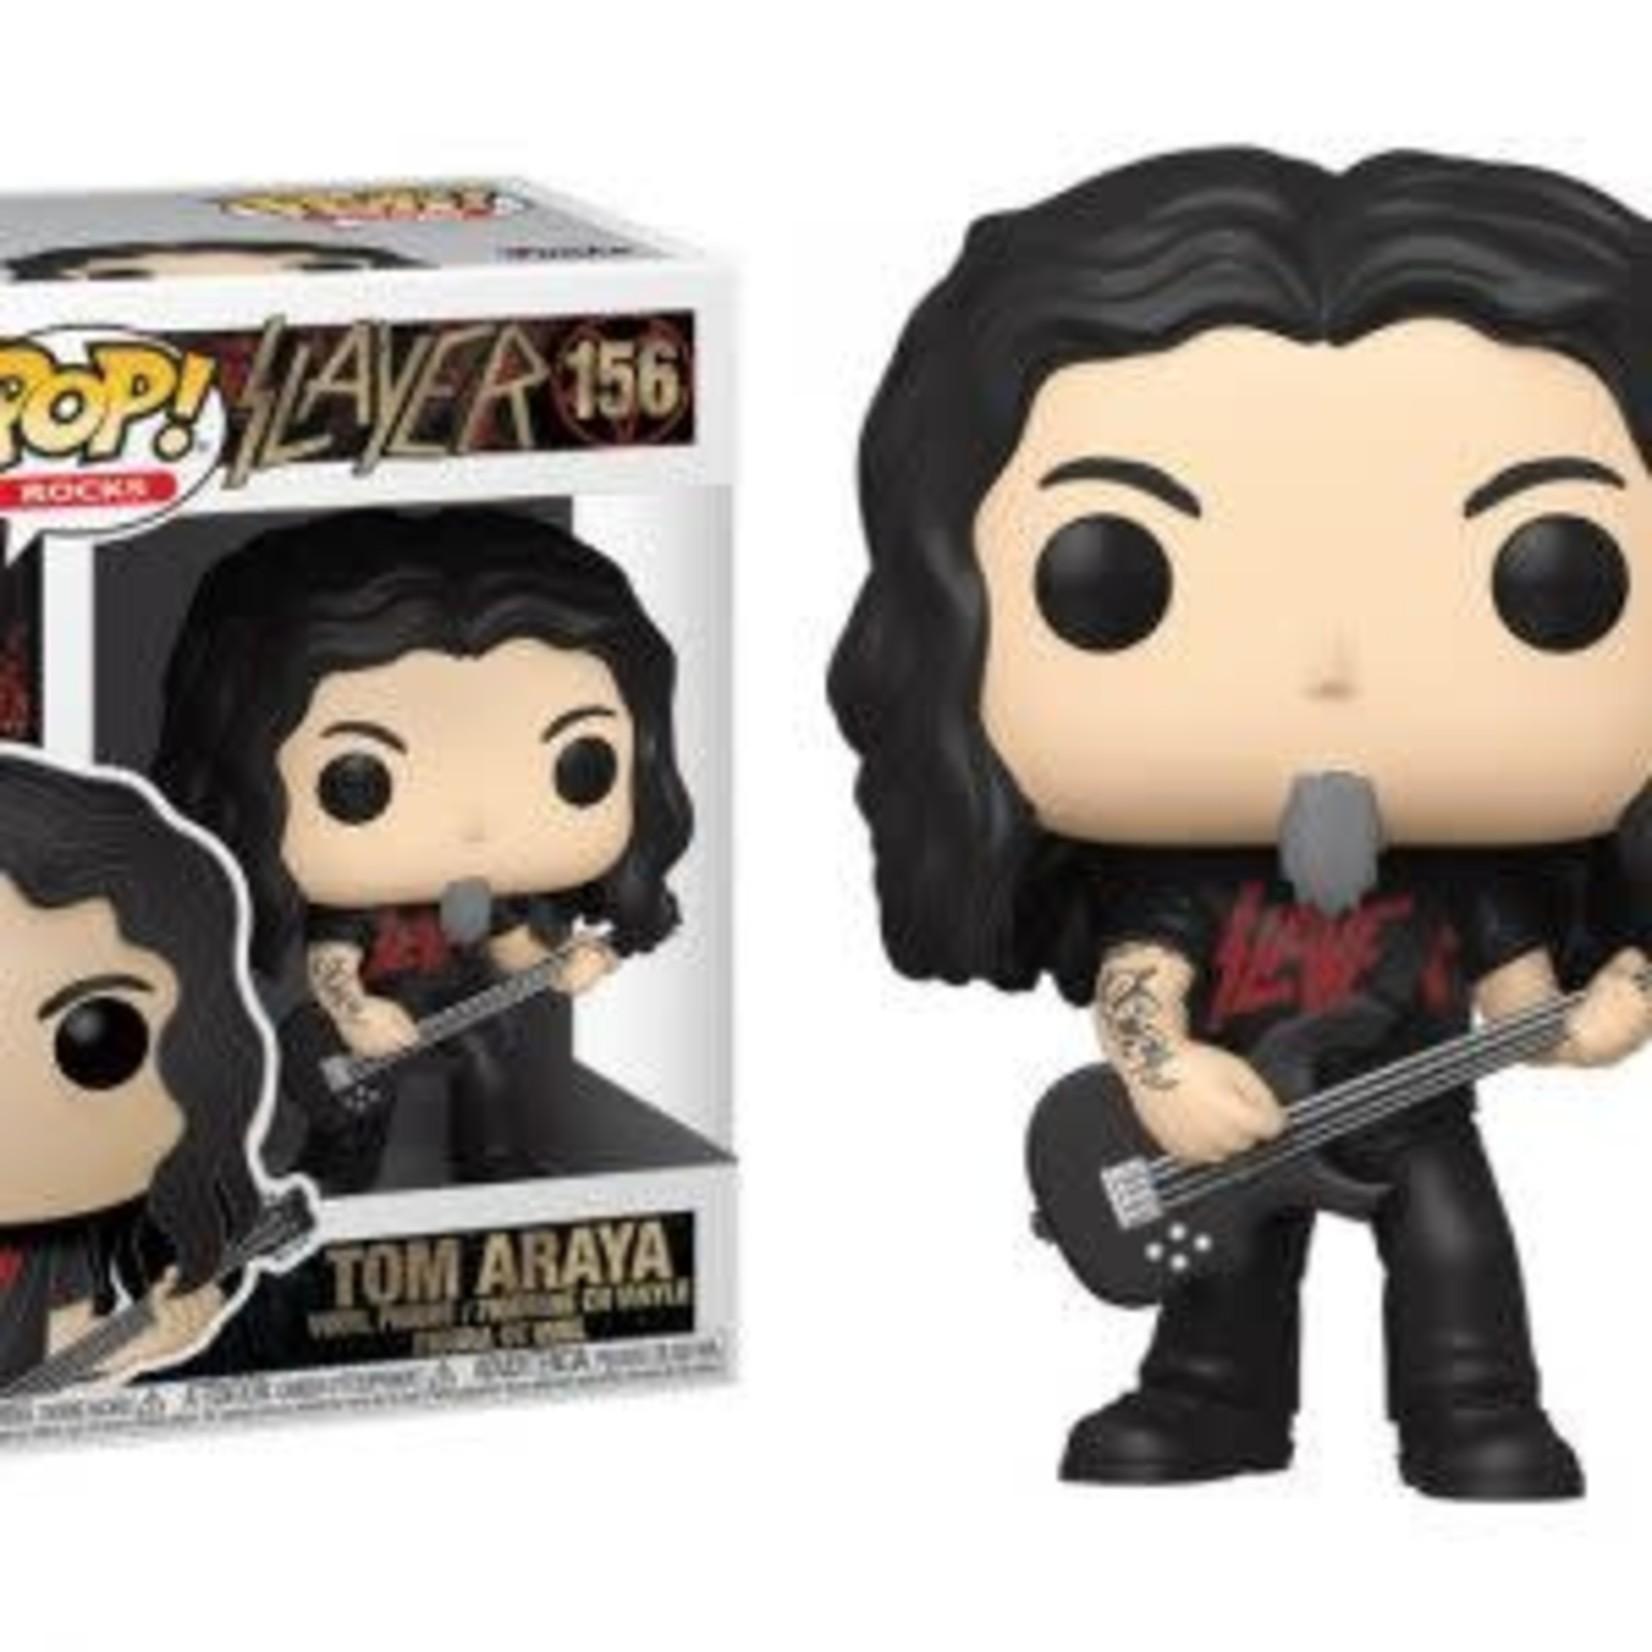 Slayer / Tom Araya POP! Rocks Vinyl Figure 9 cm nr 156